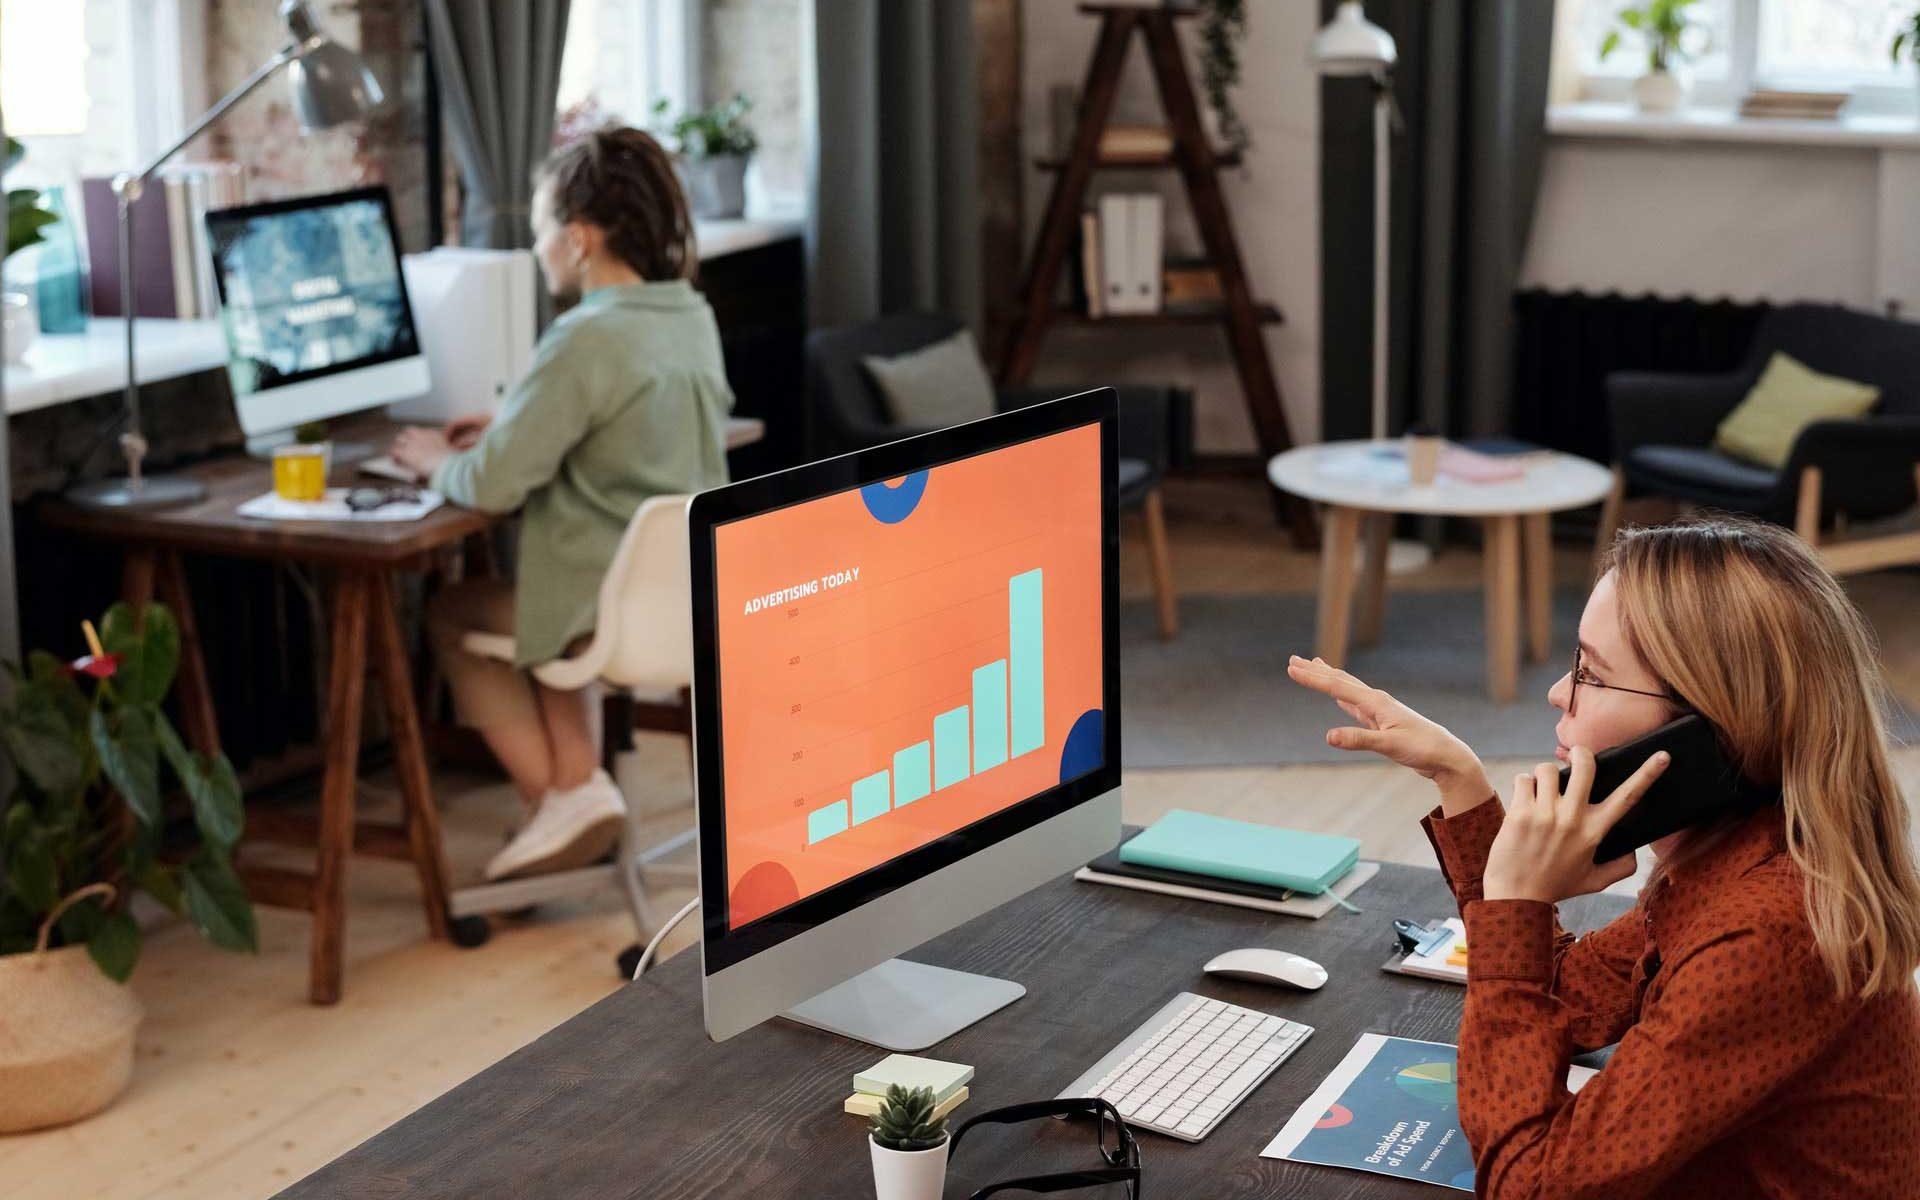 Economic Shift in Digital Marketing: Understanding Behavioral Changes in the Global Consumer Mindset